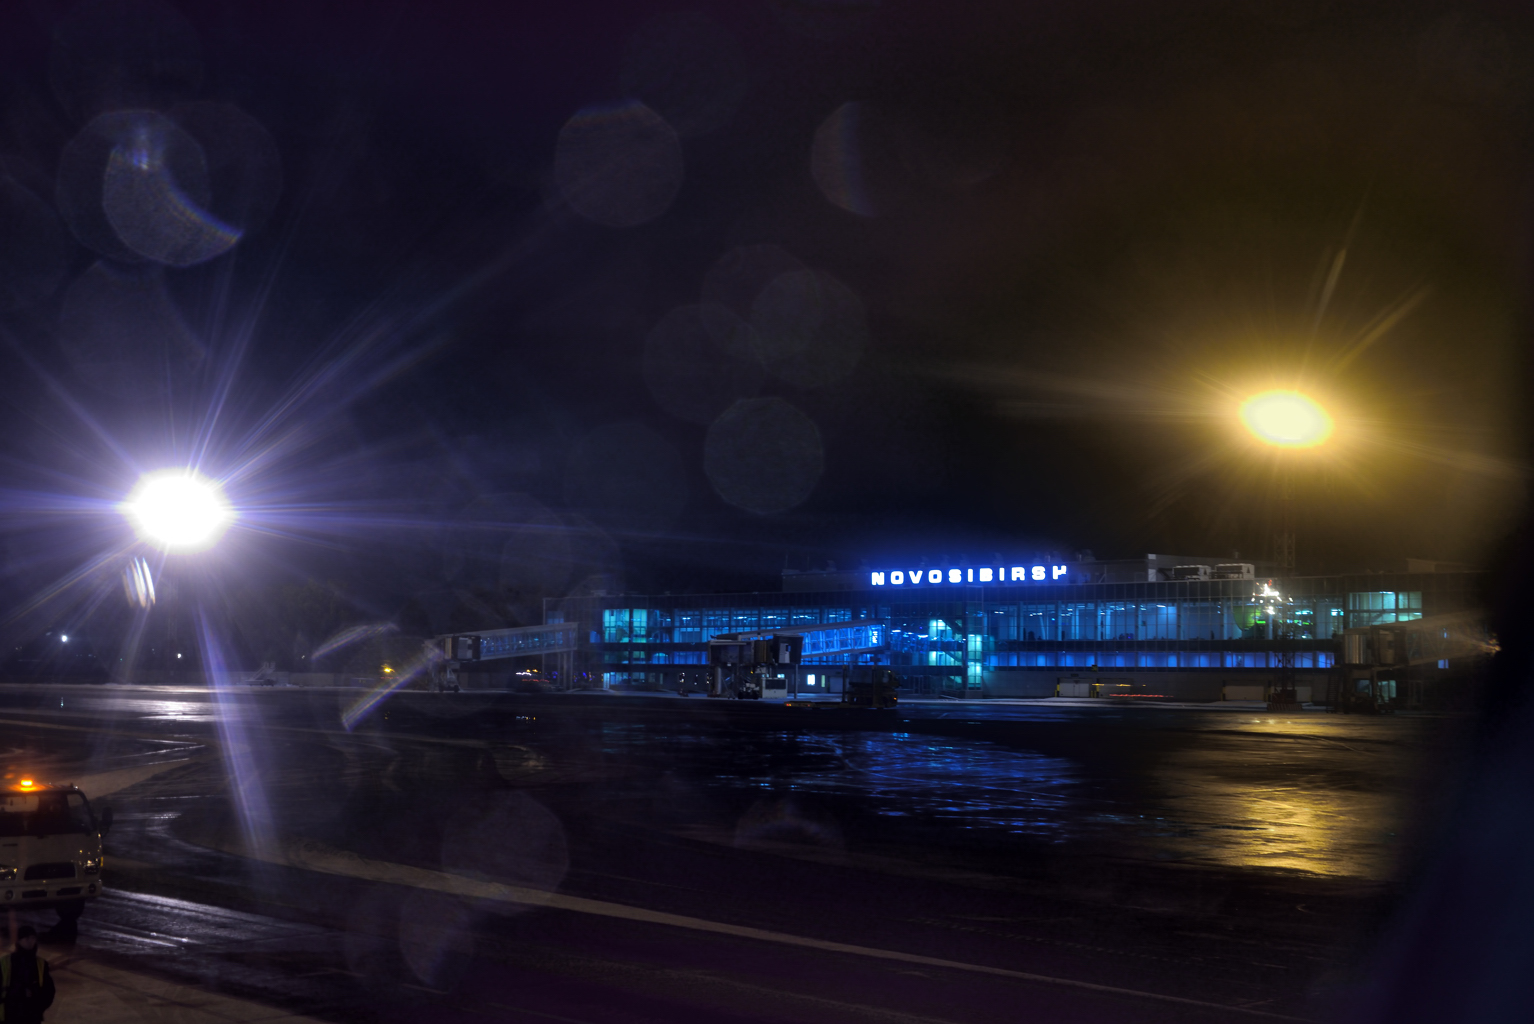 аэропорт Новосибирск (Толмачёво)